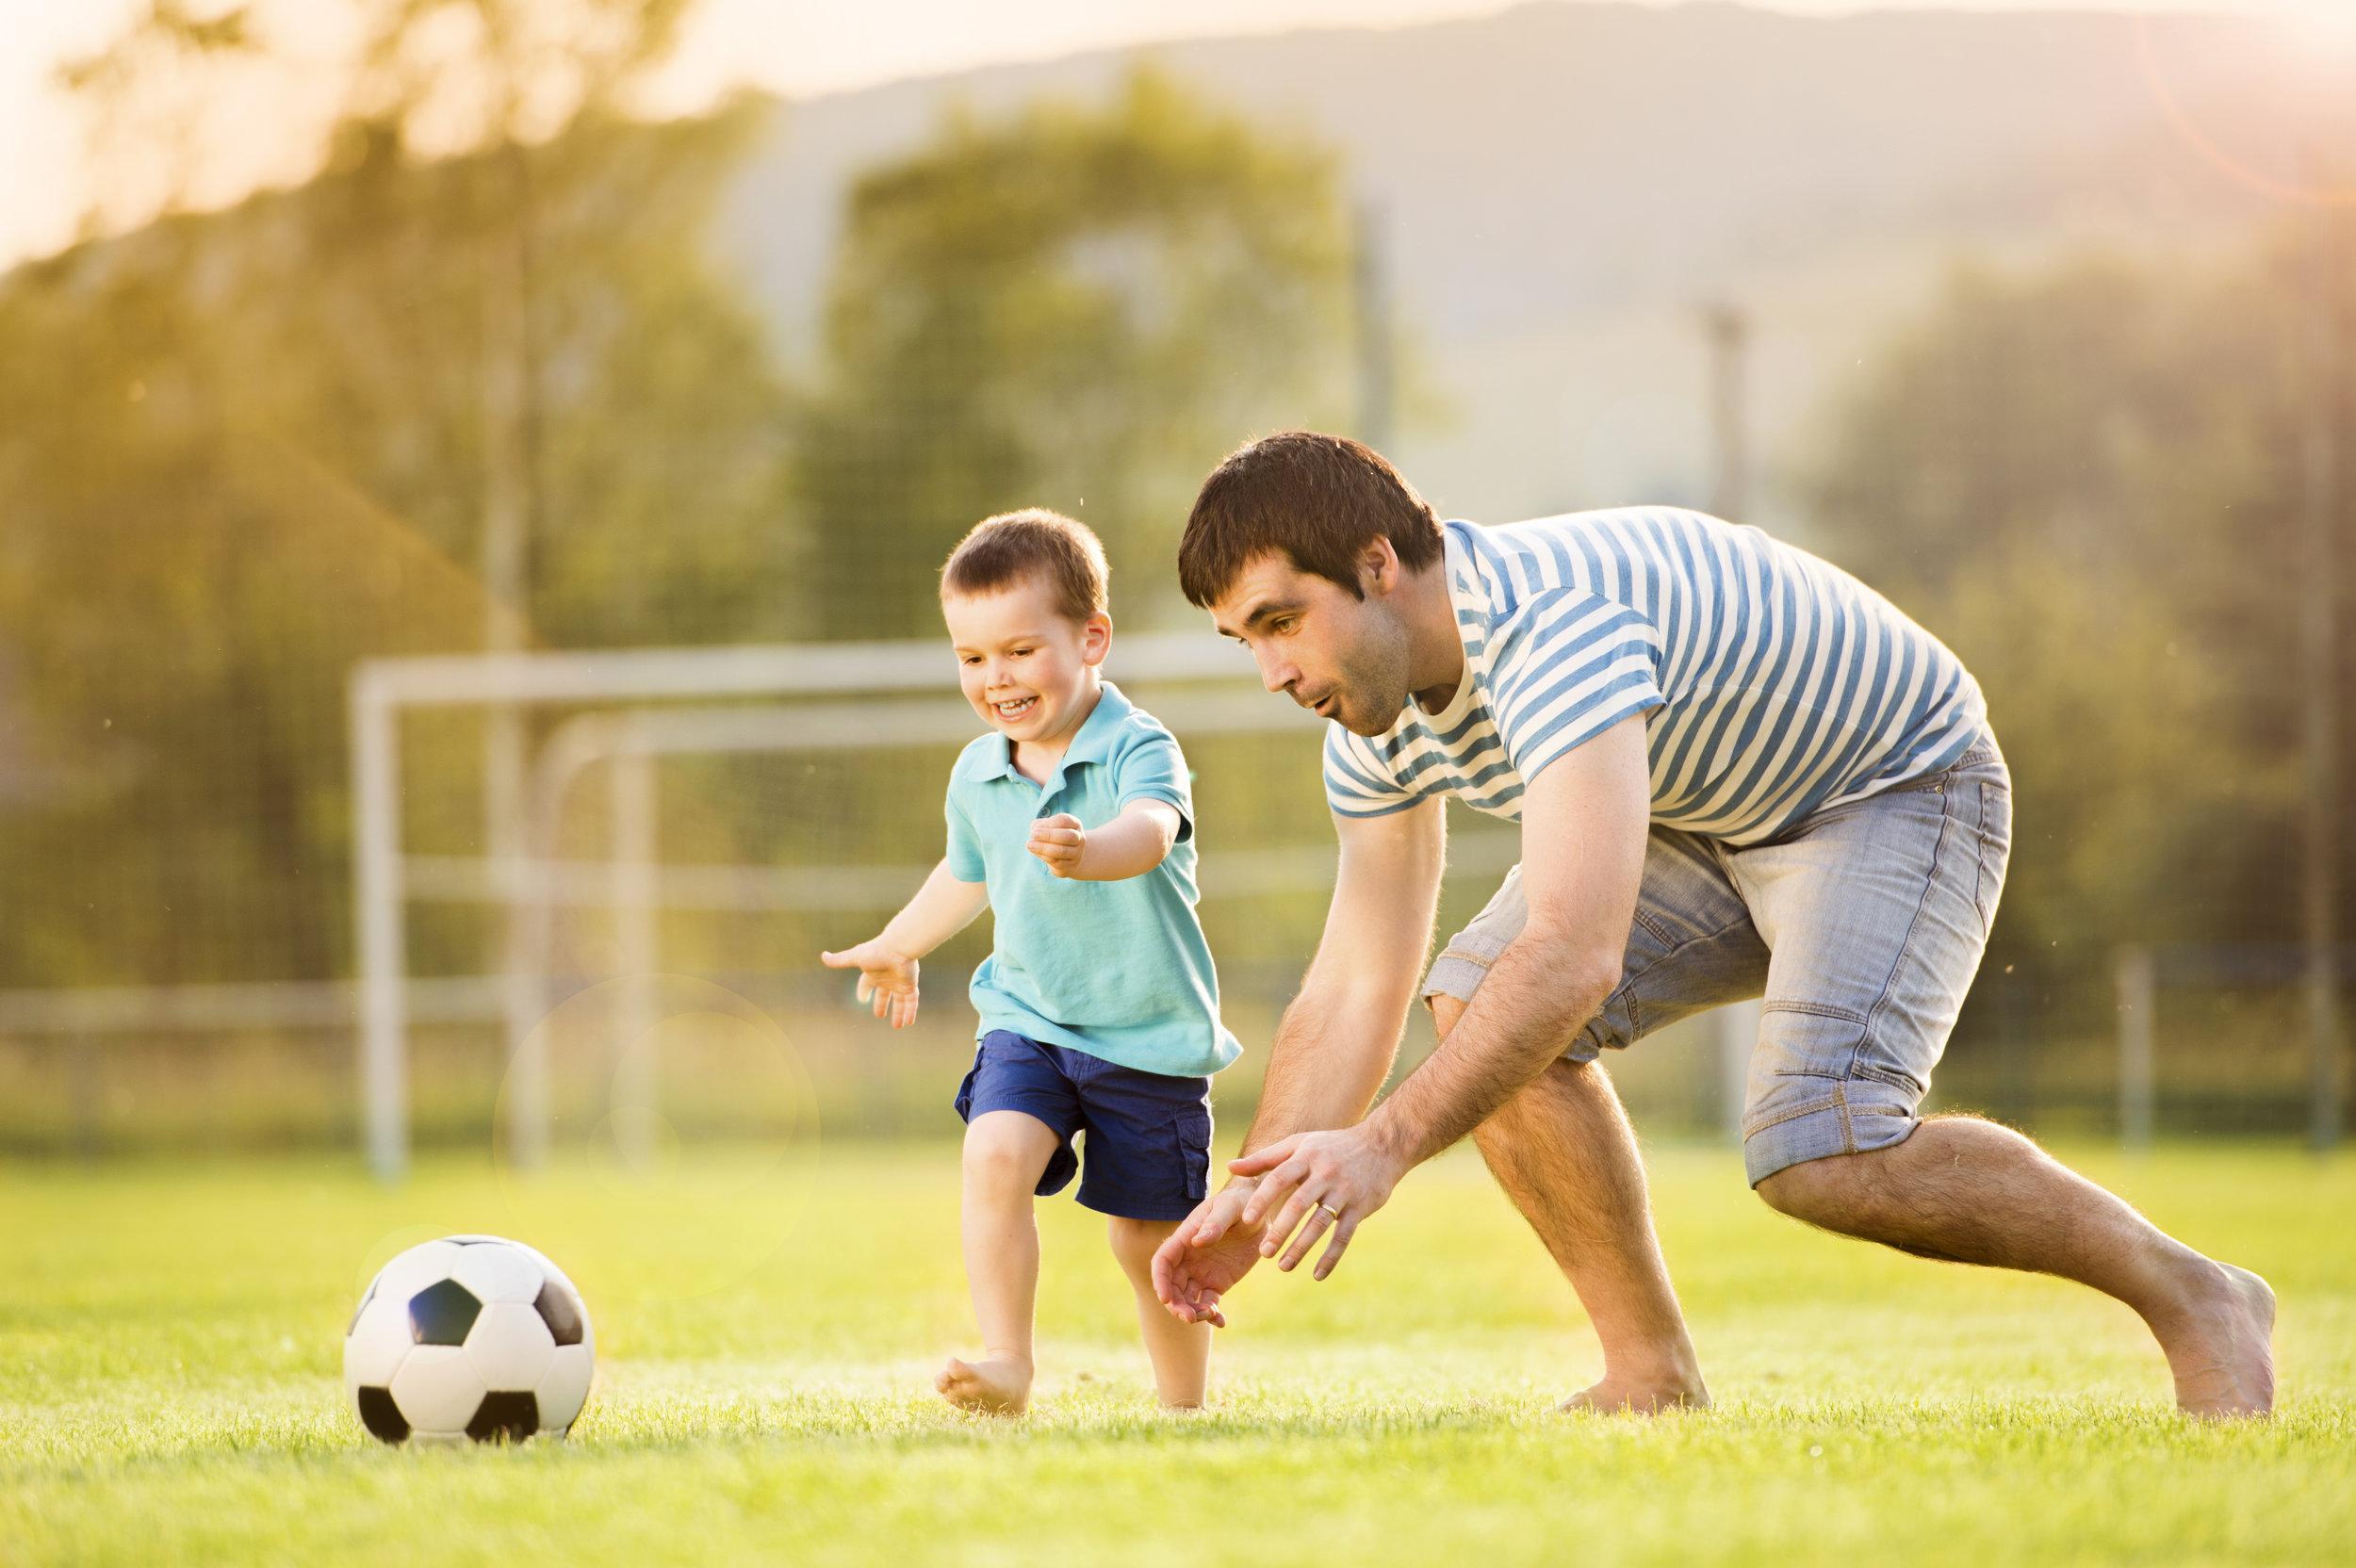 coaching-soccer.jpg